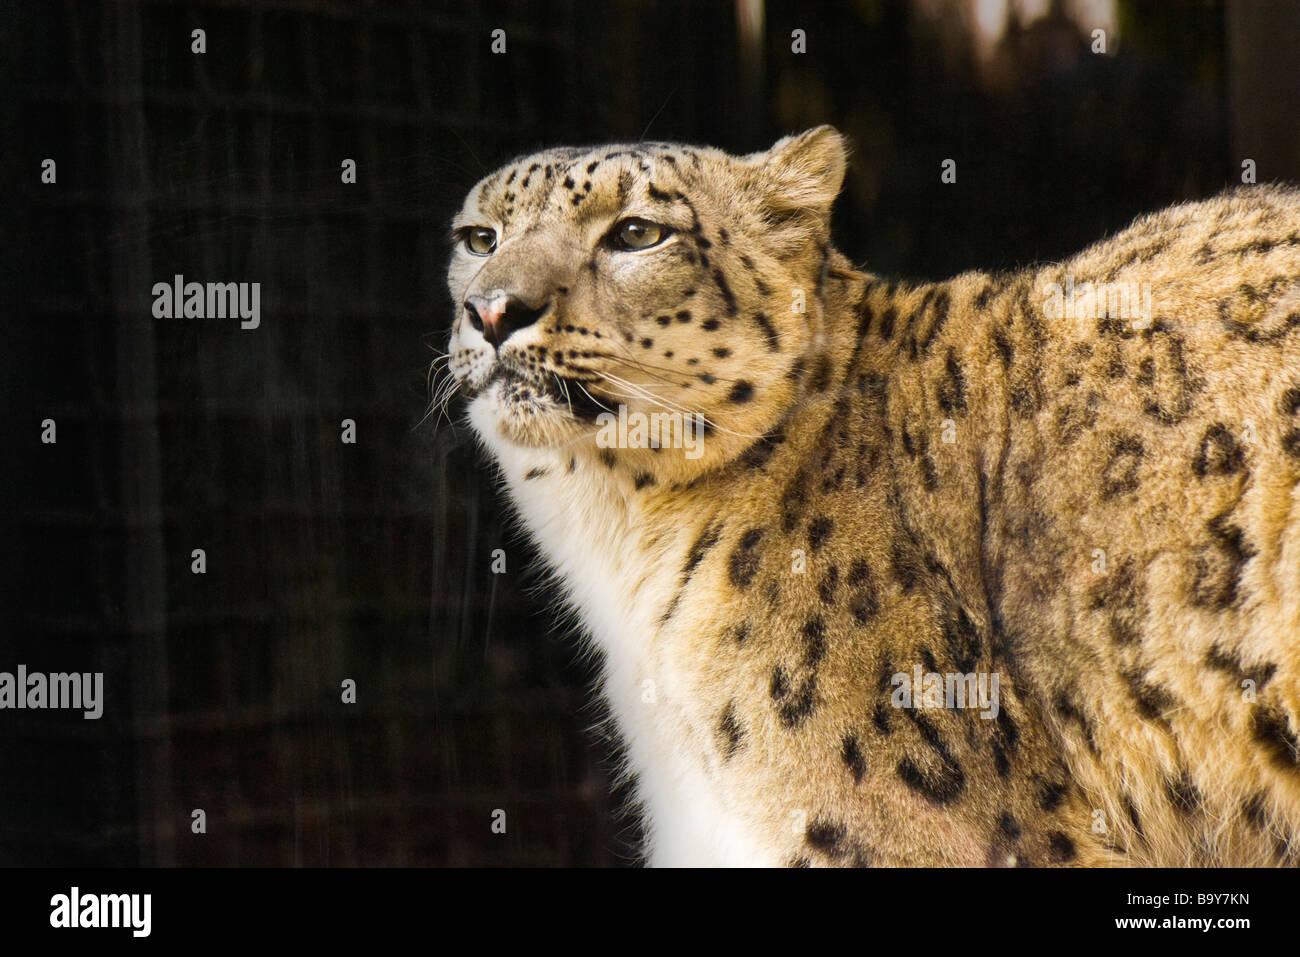 Leopard (Panthera pardus) - Stock Image